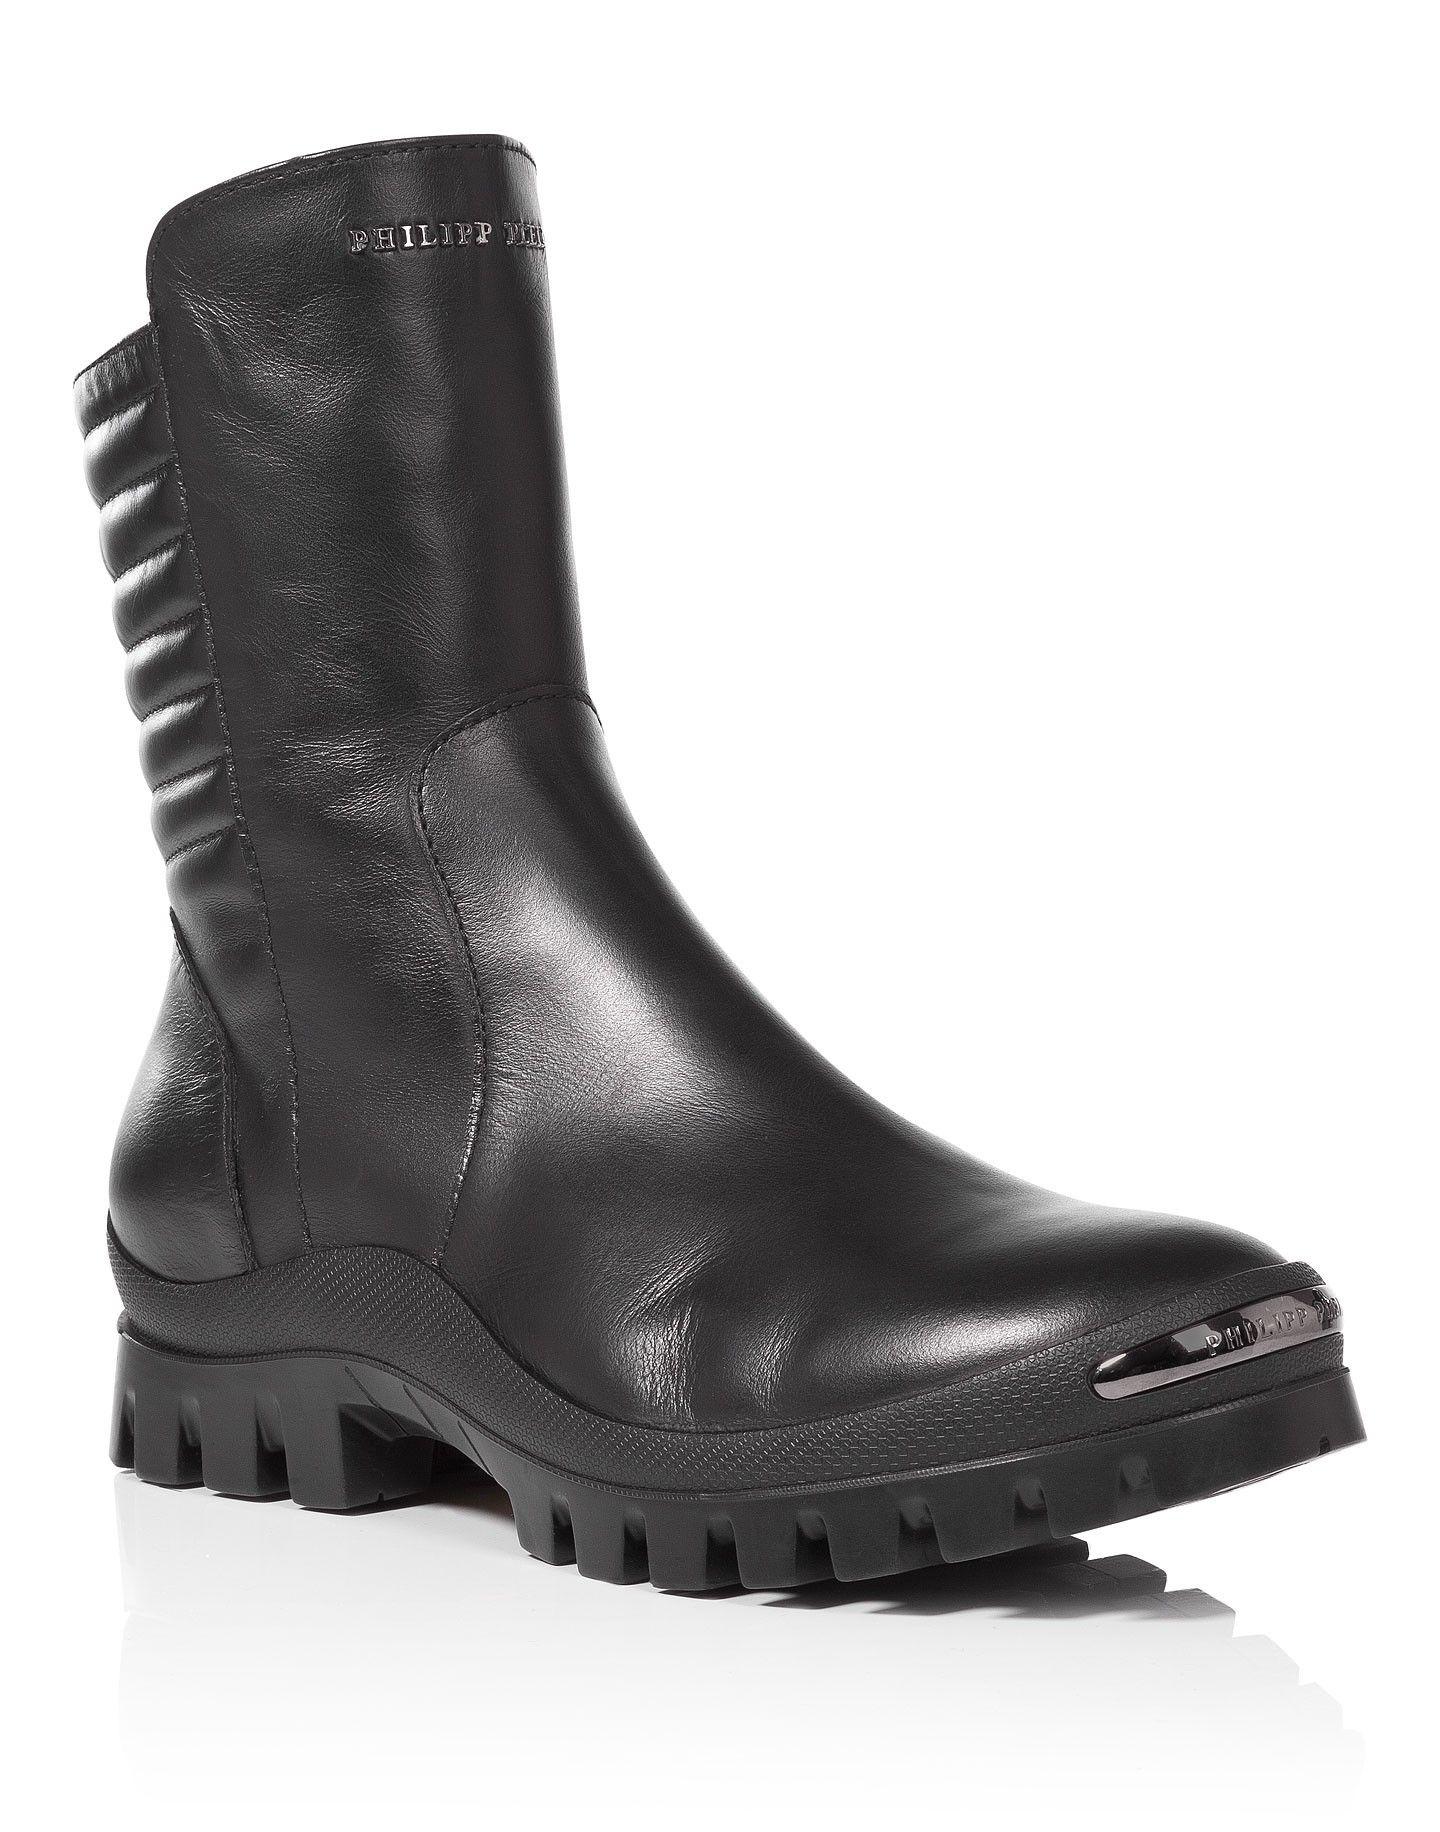 "PHILIPP PLEIN Boots ""Rude Boy"". #philippplein #shoes #"